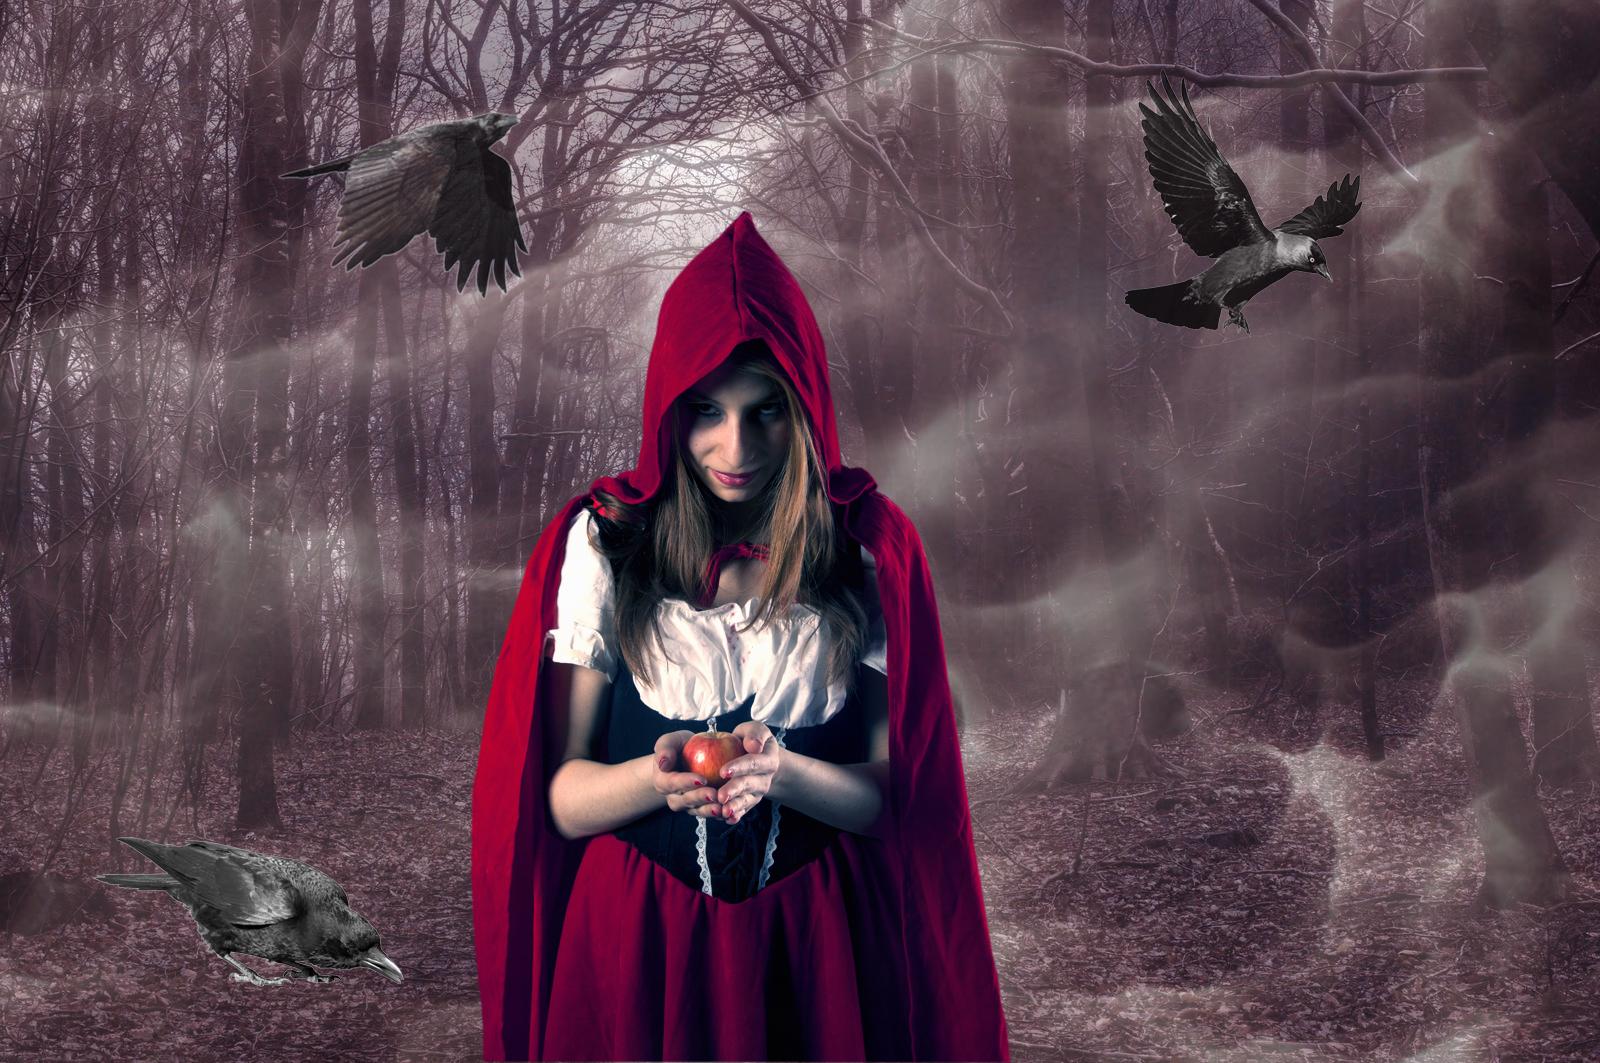 DarkWoods_Red